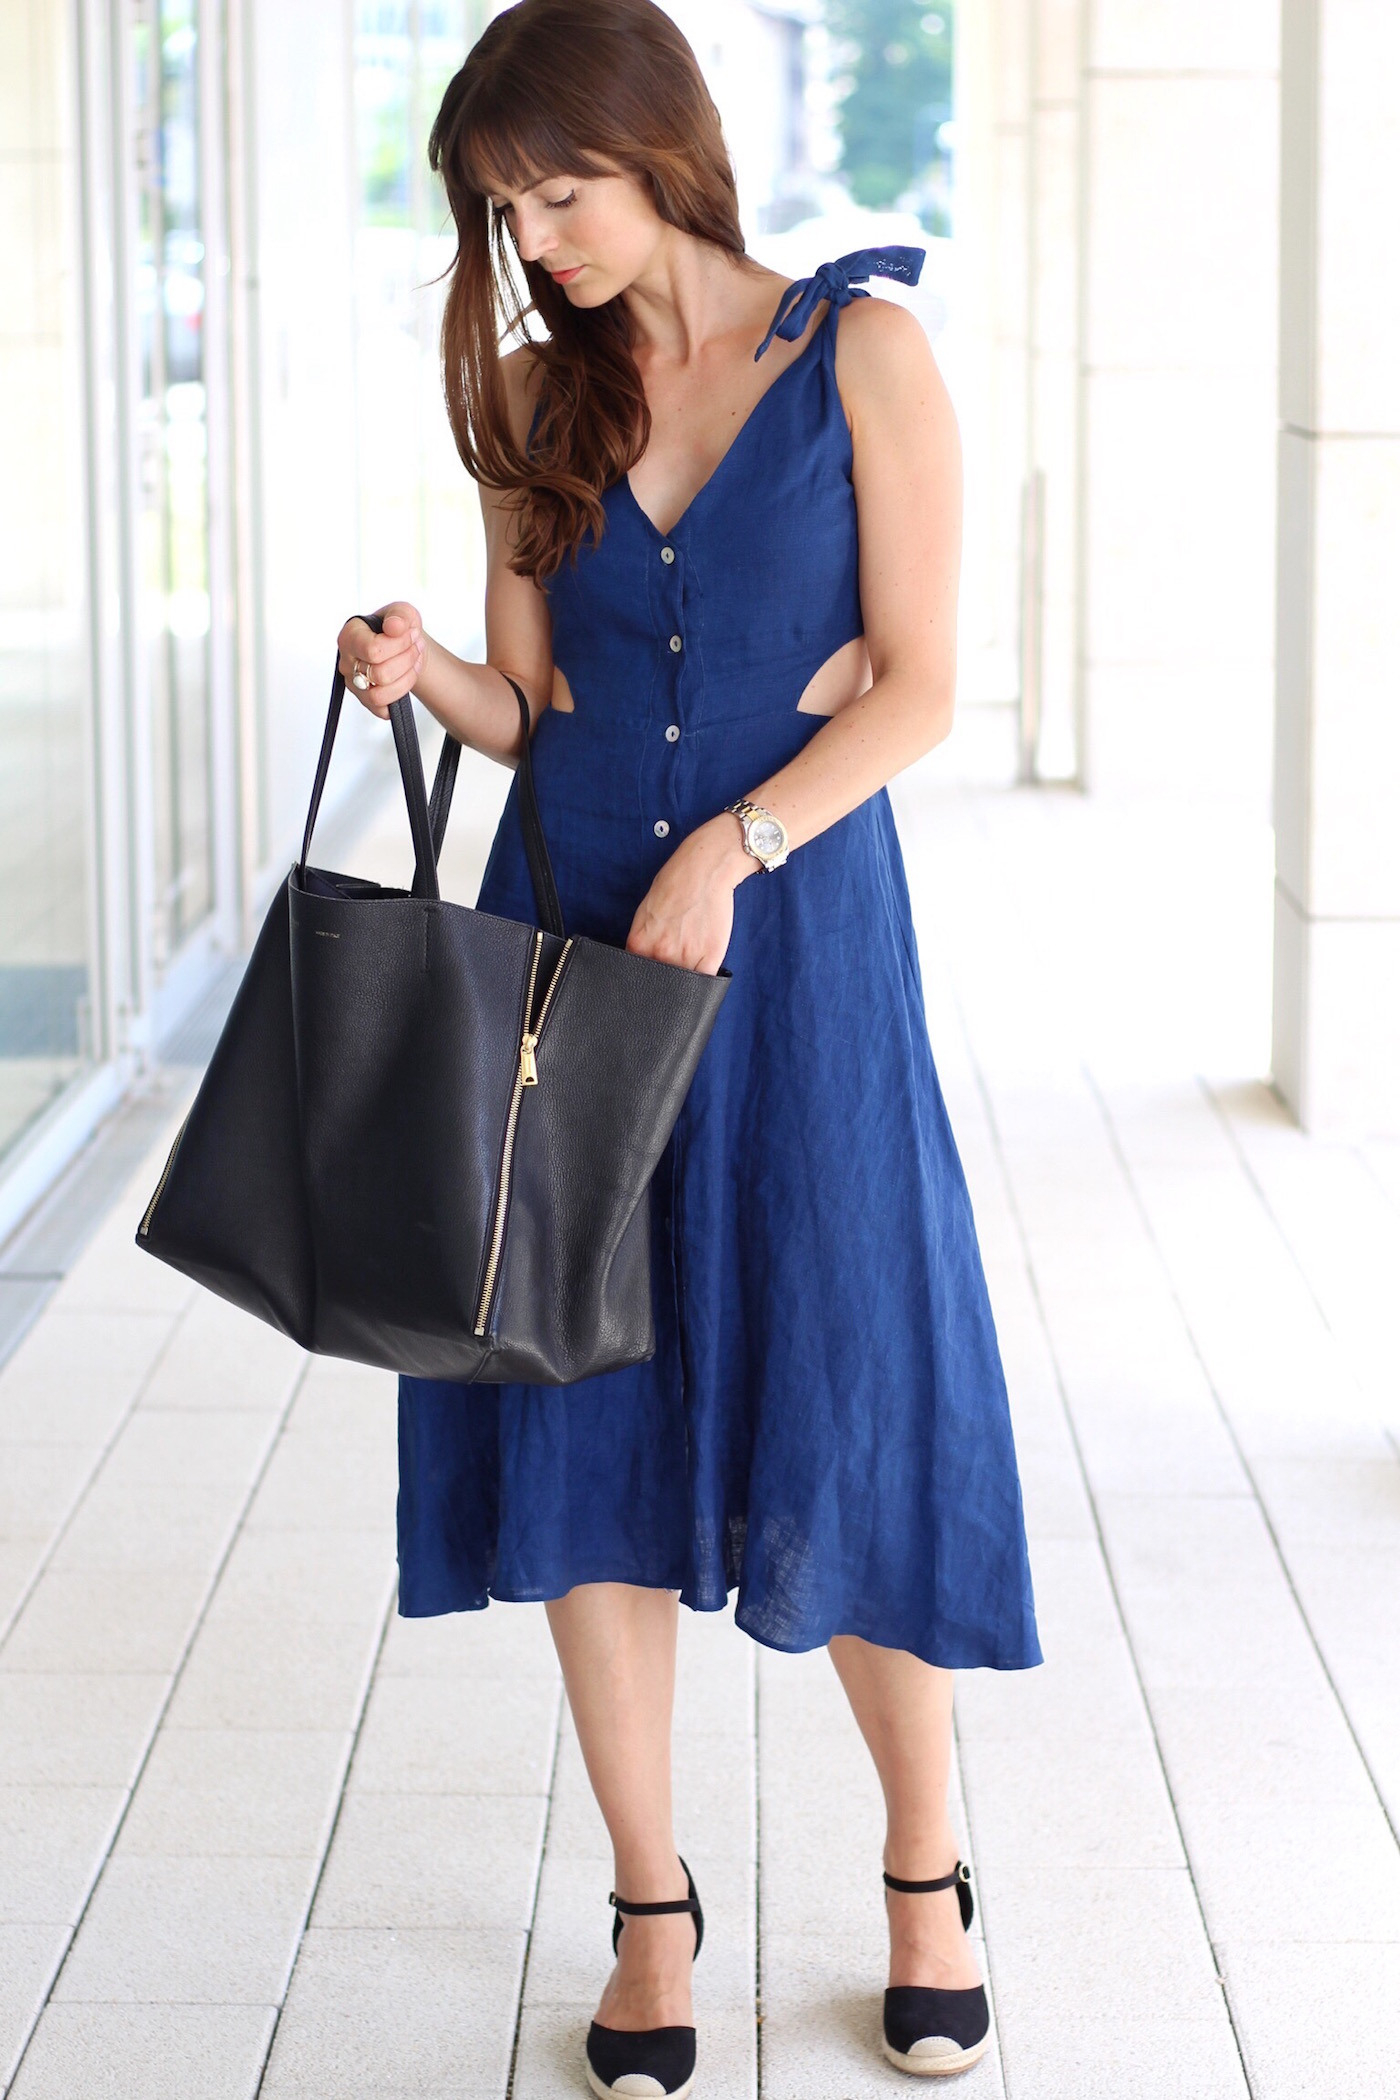 Outfit Zara Cutout Midikleid Céline Cabas Bag Und